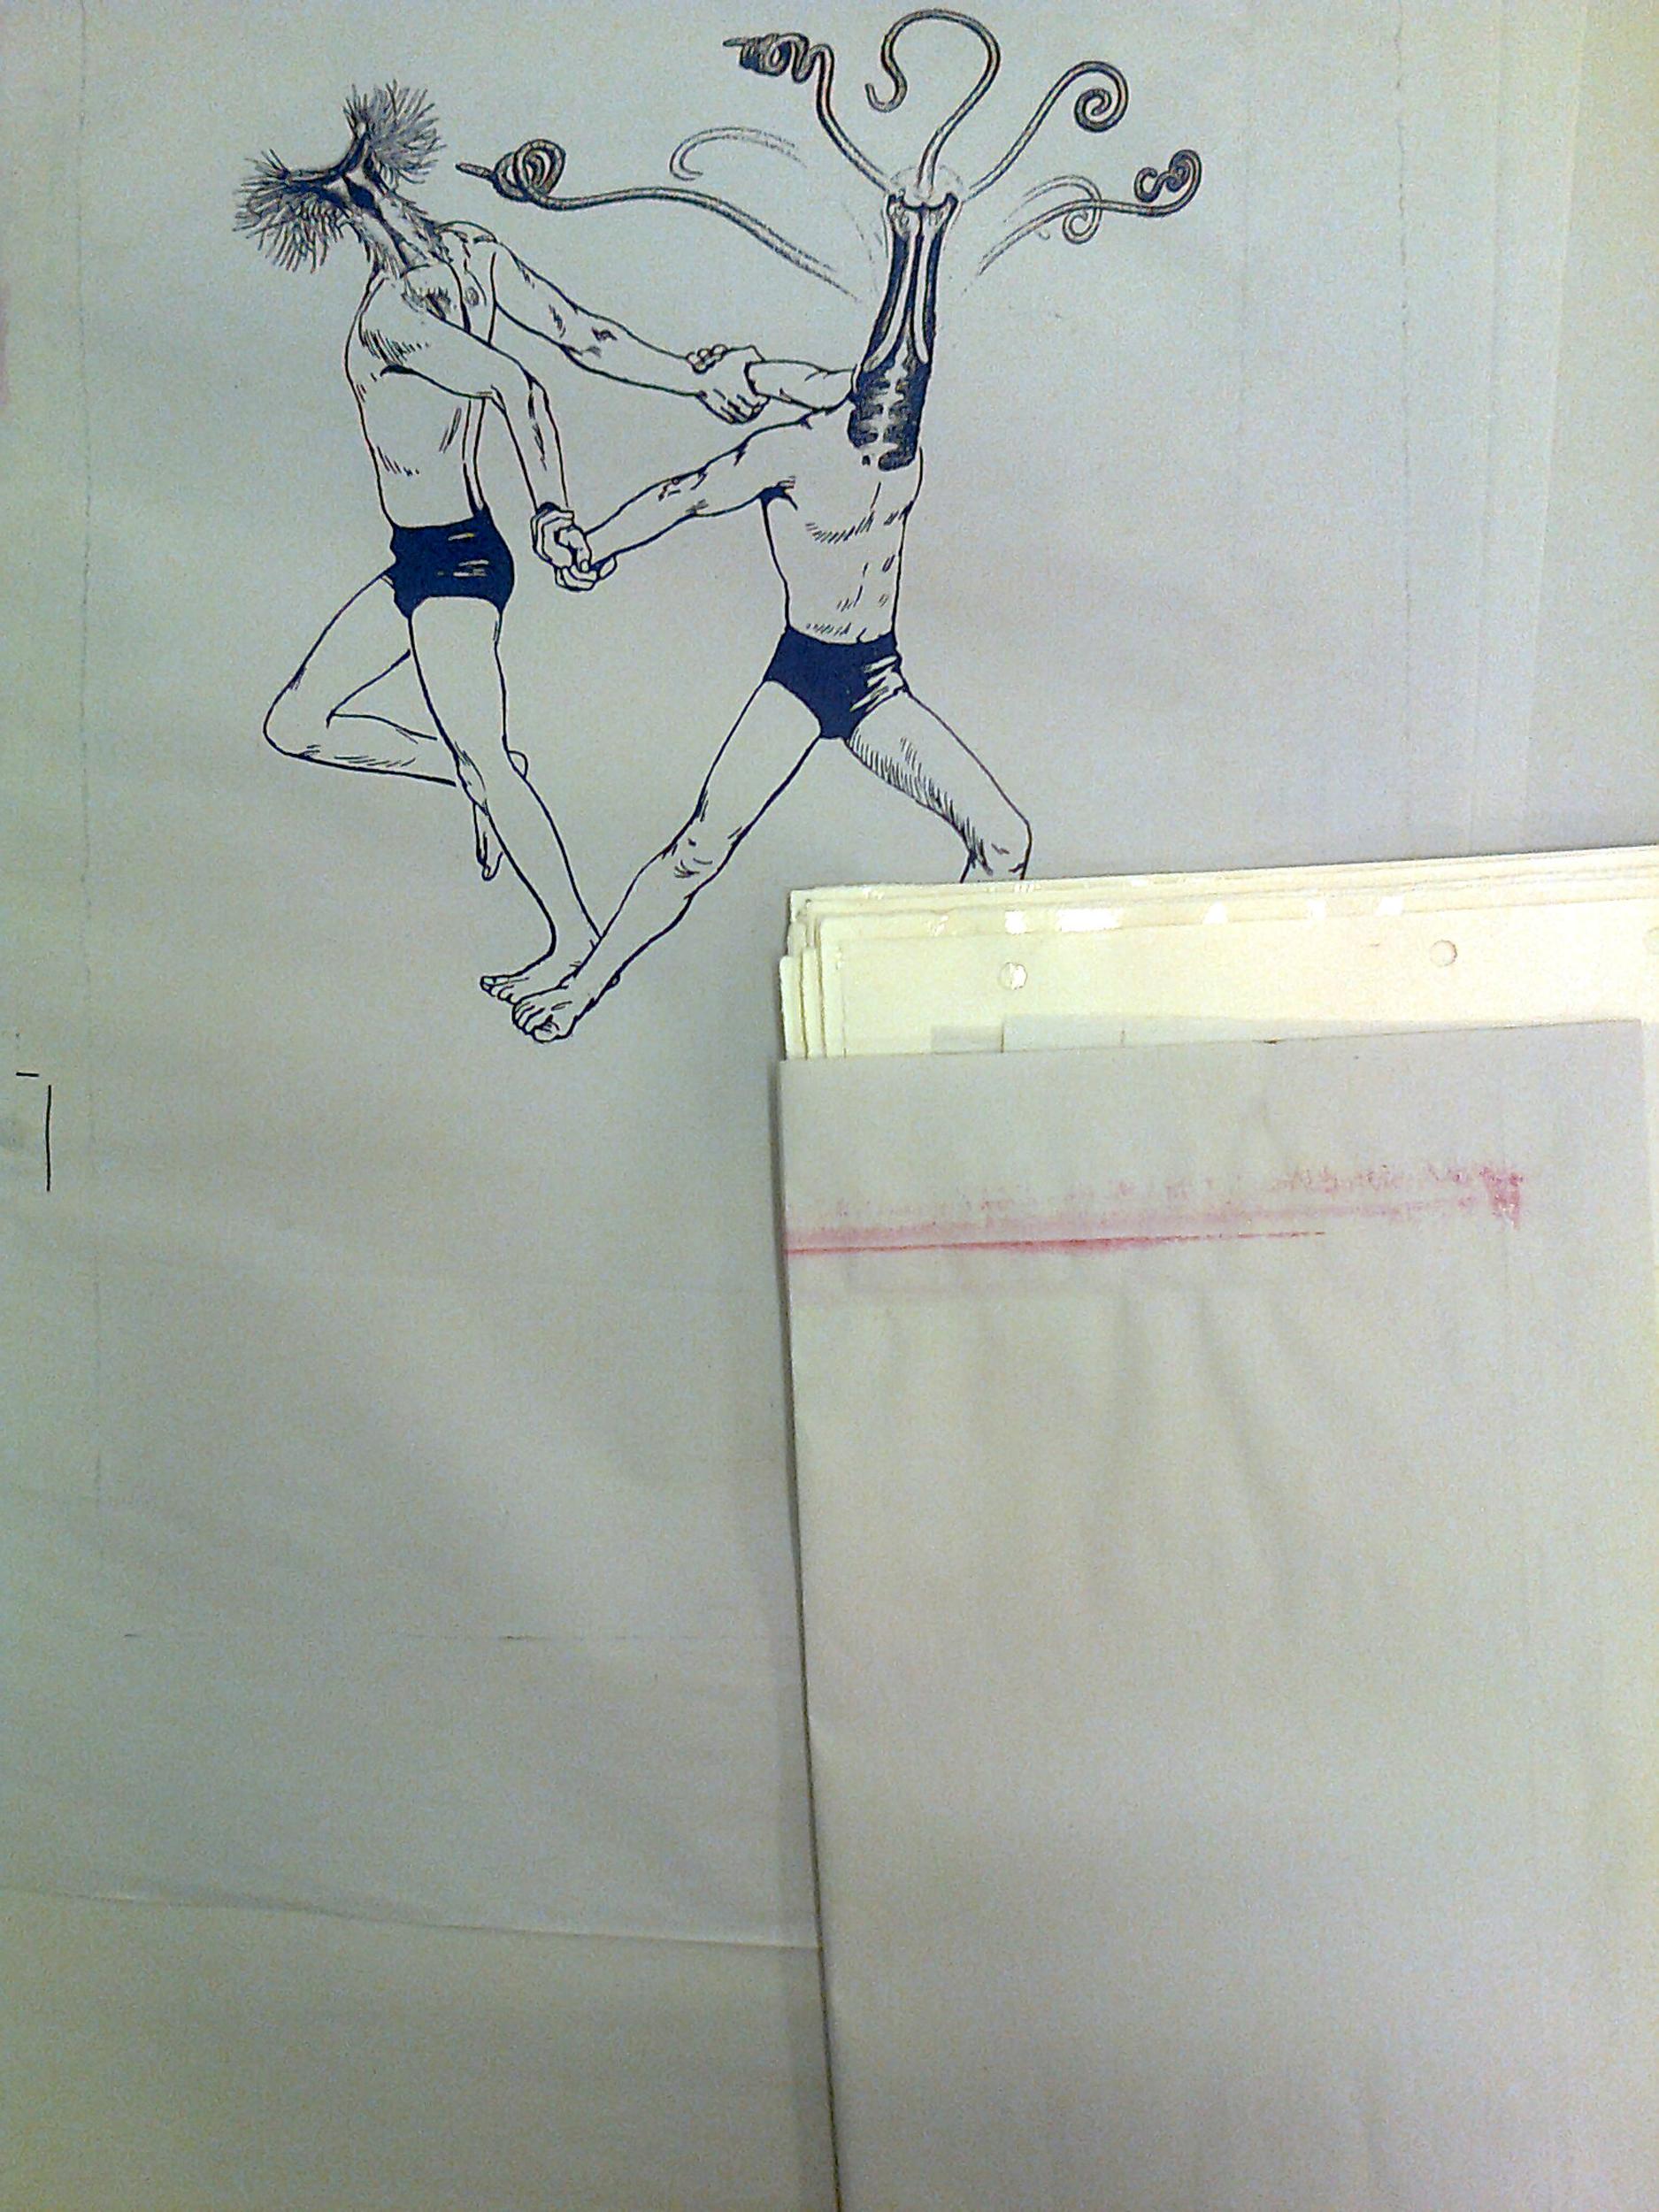 testimonial-i-iii-iii-progress-documentation-cellphone-sketchbook-064.jpg